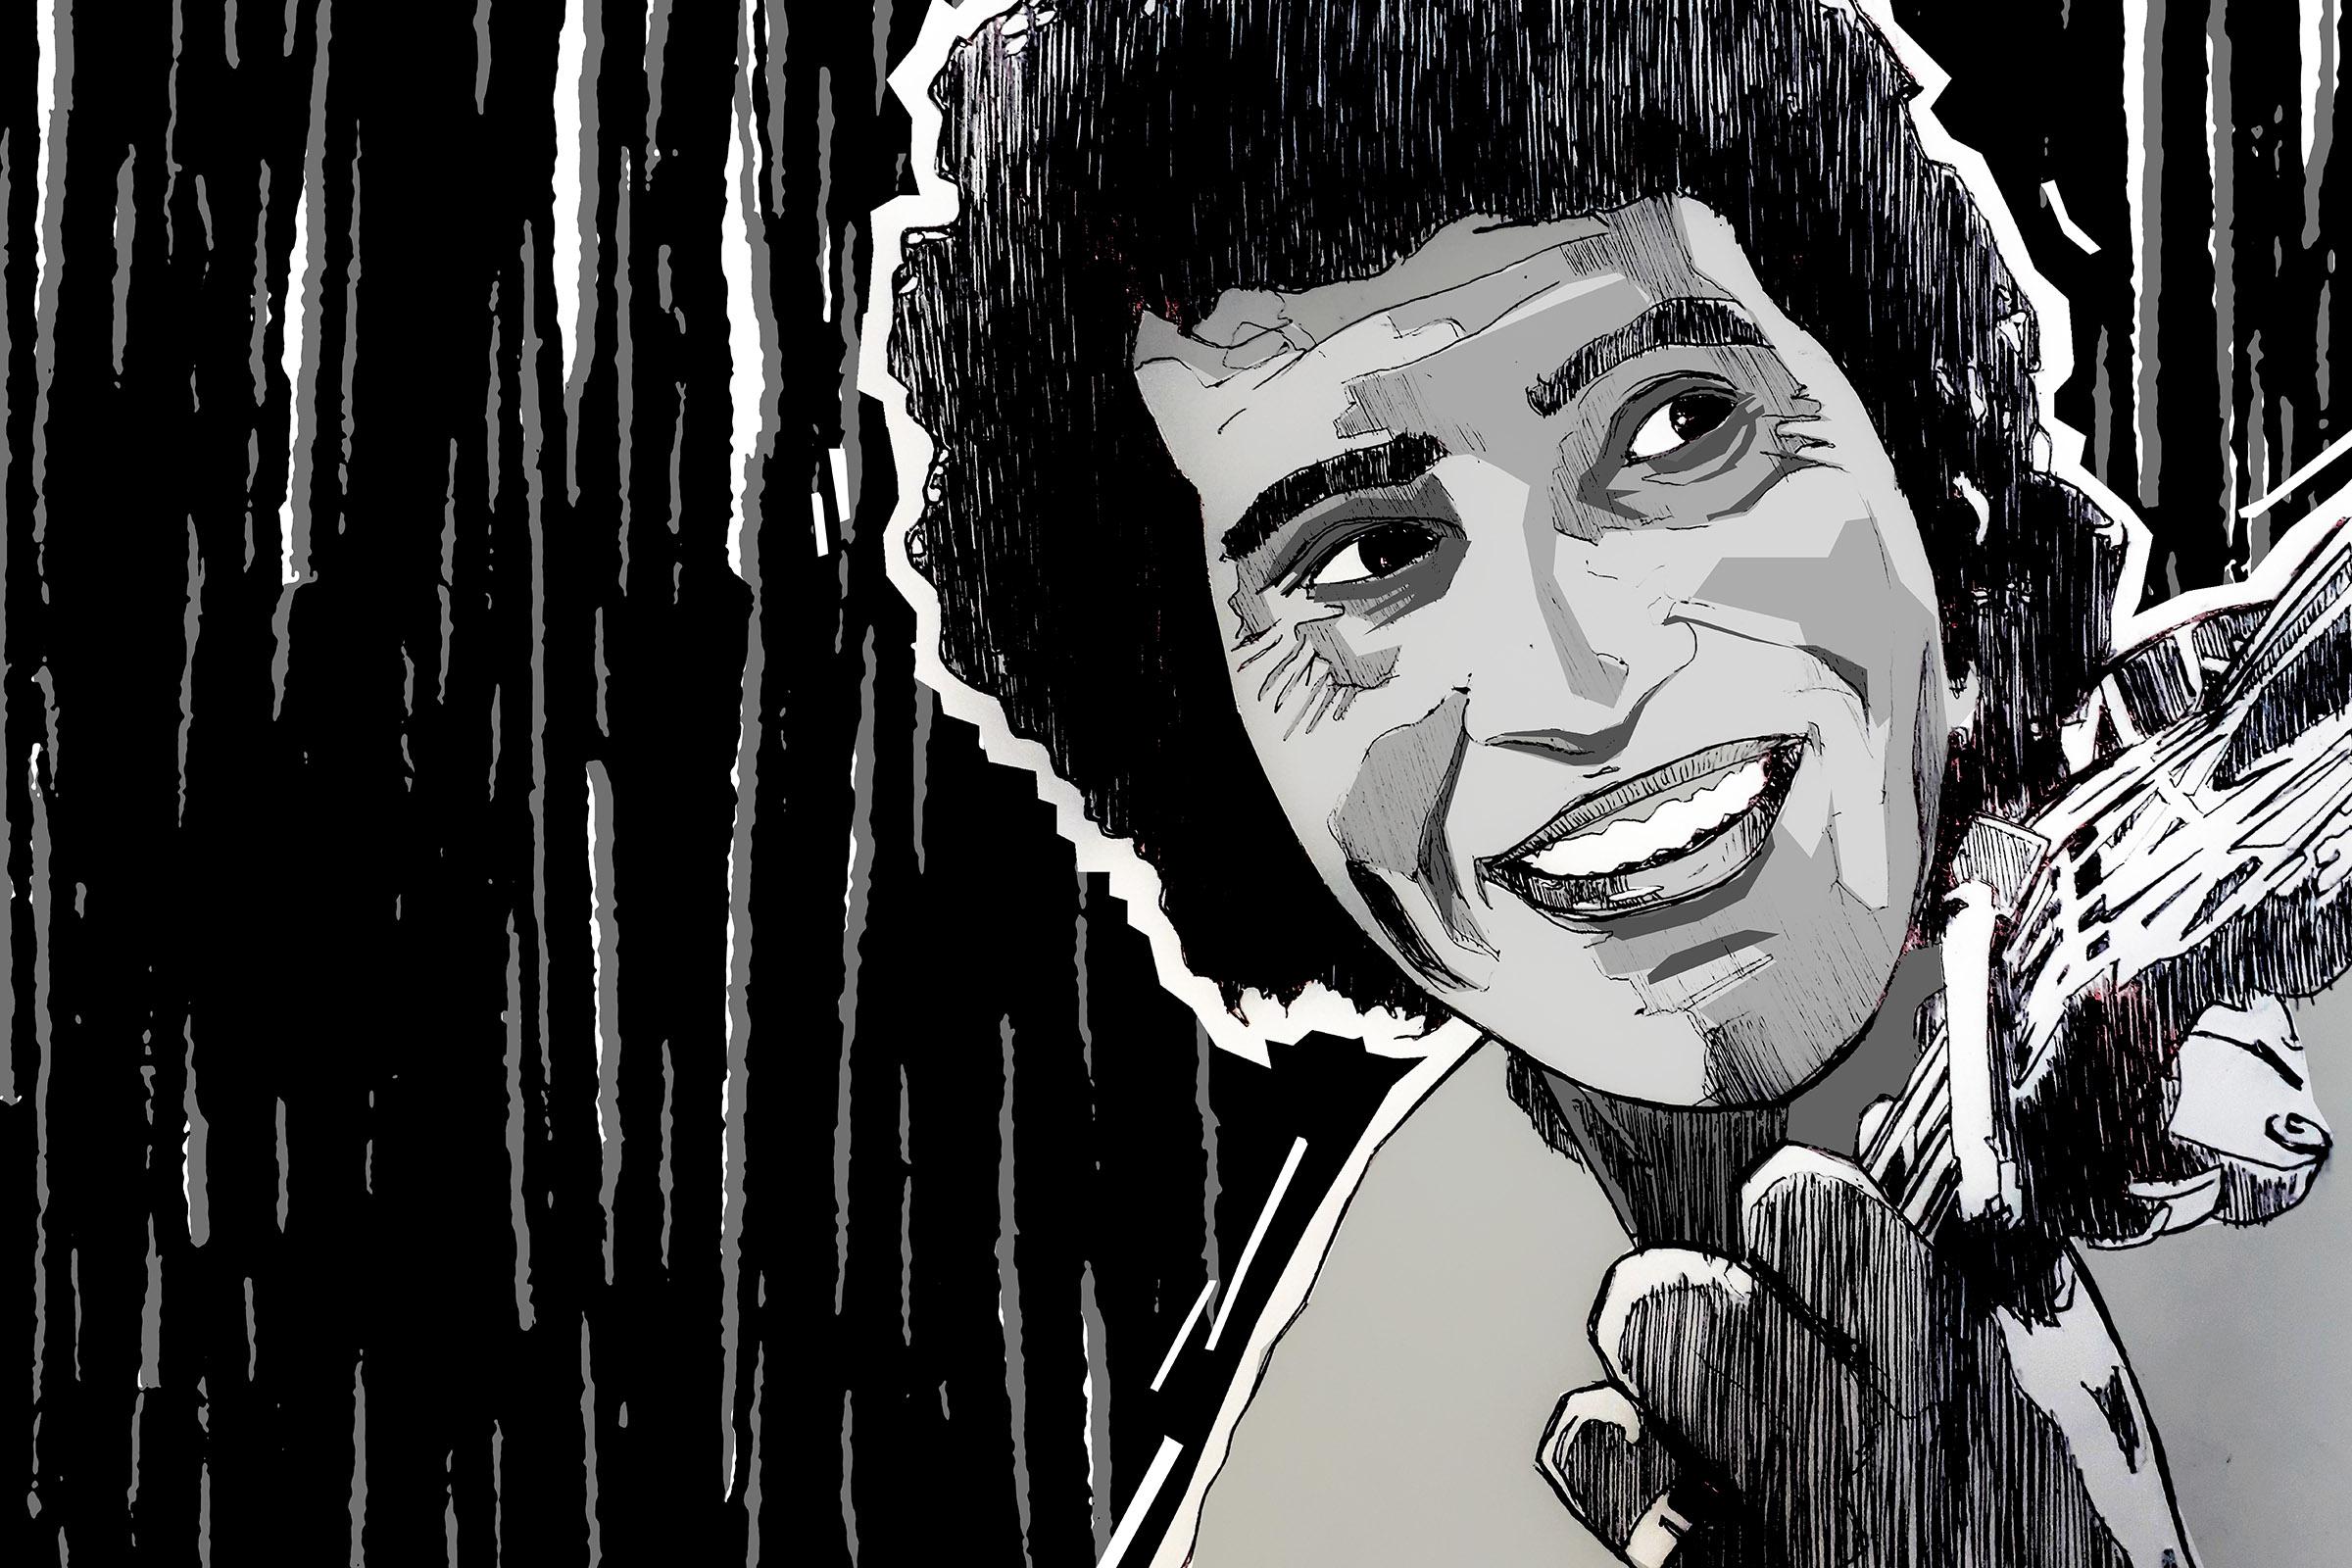 Illustration of Victor Jara by Nivesh Rawatlal